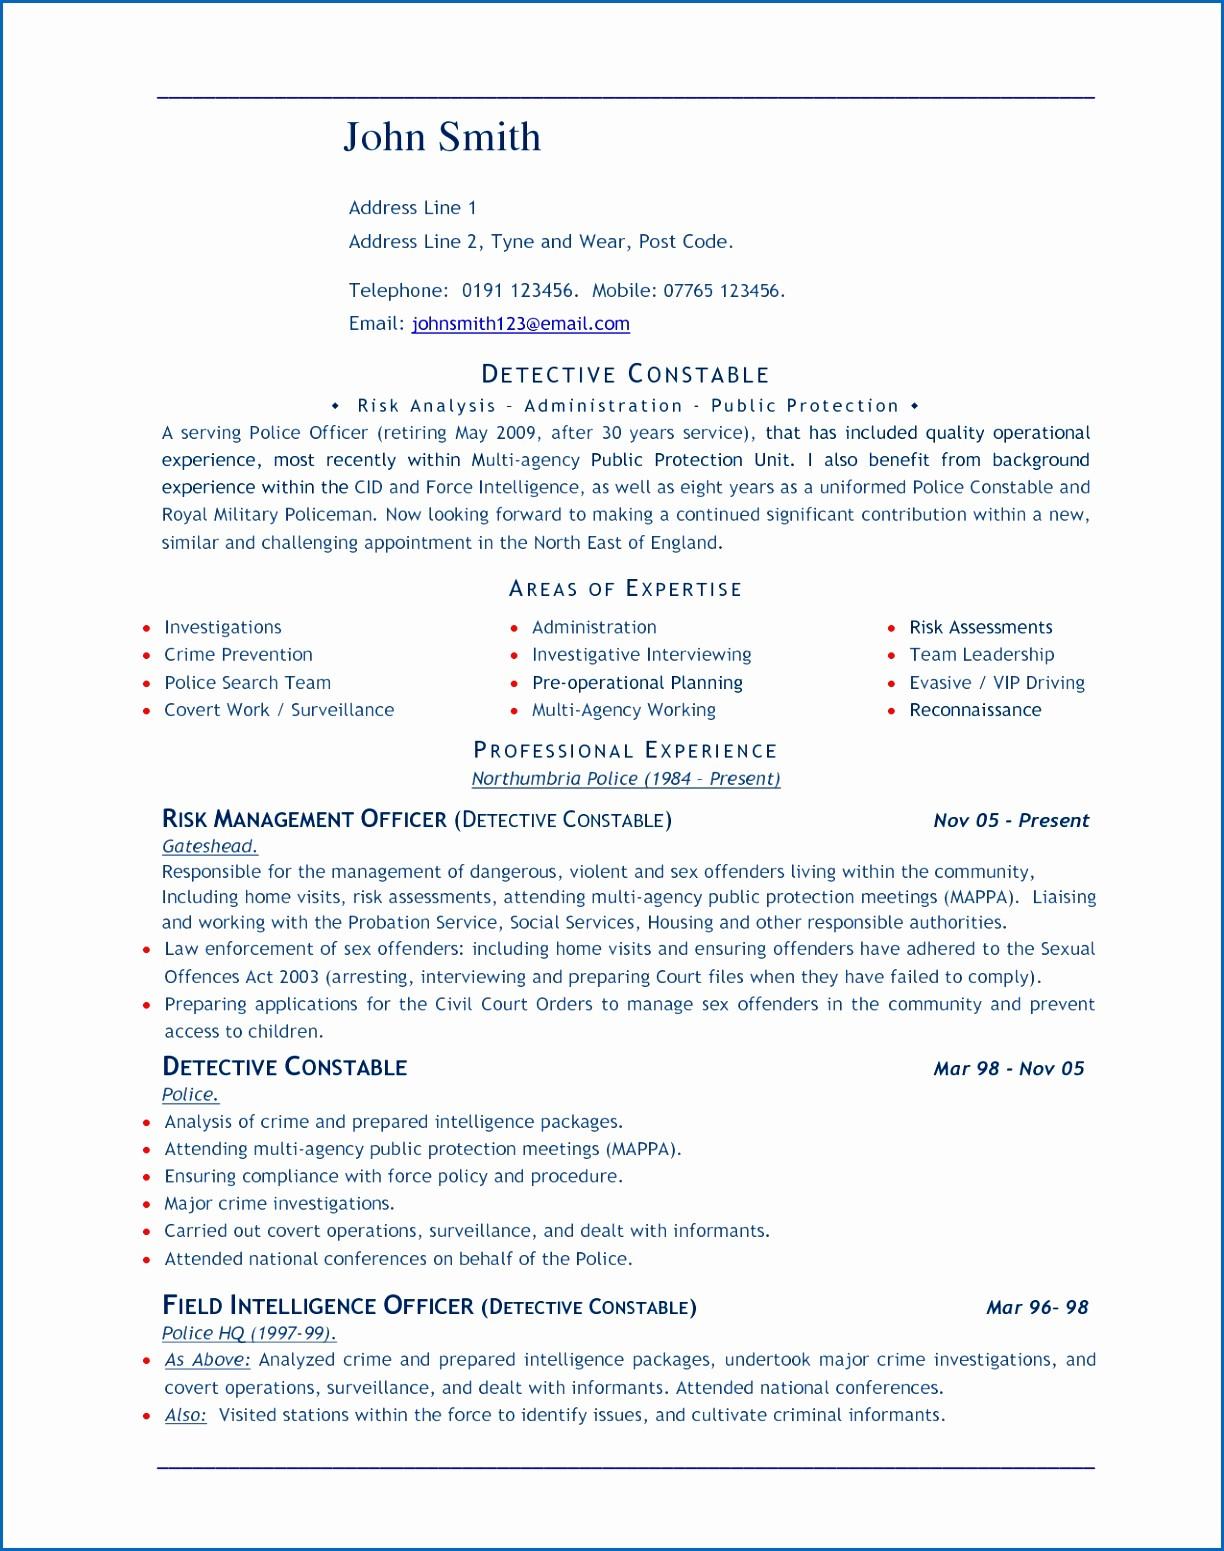 Microsoft Word Resume Template 2017 Unique Microsoft Word Cv Template Resume Job Cv Skabelon Word